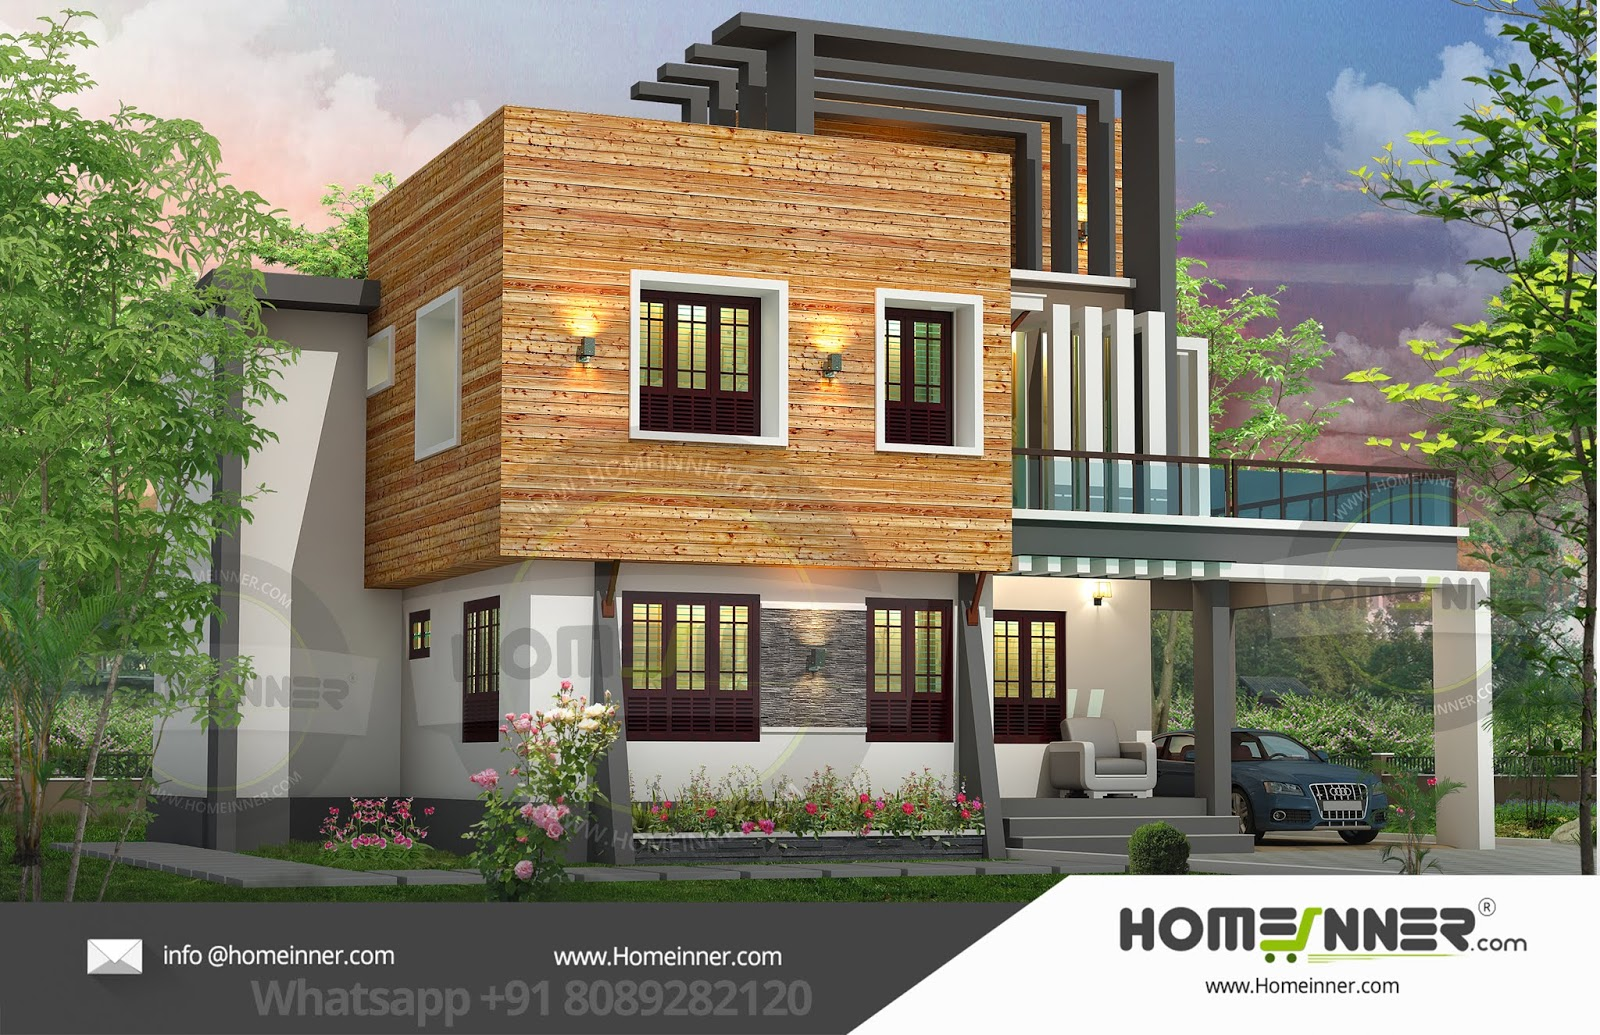 26 Lakh 3 BHK 1840 sq ft Aurangabad Villa